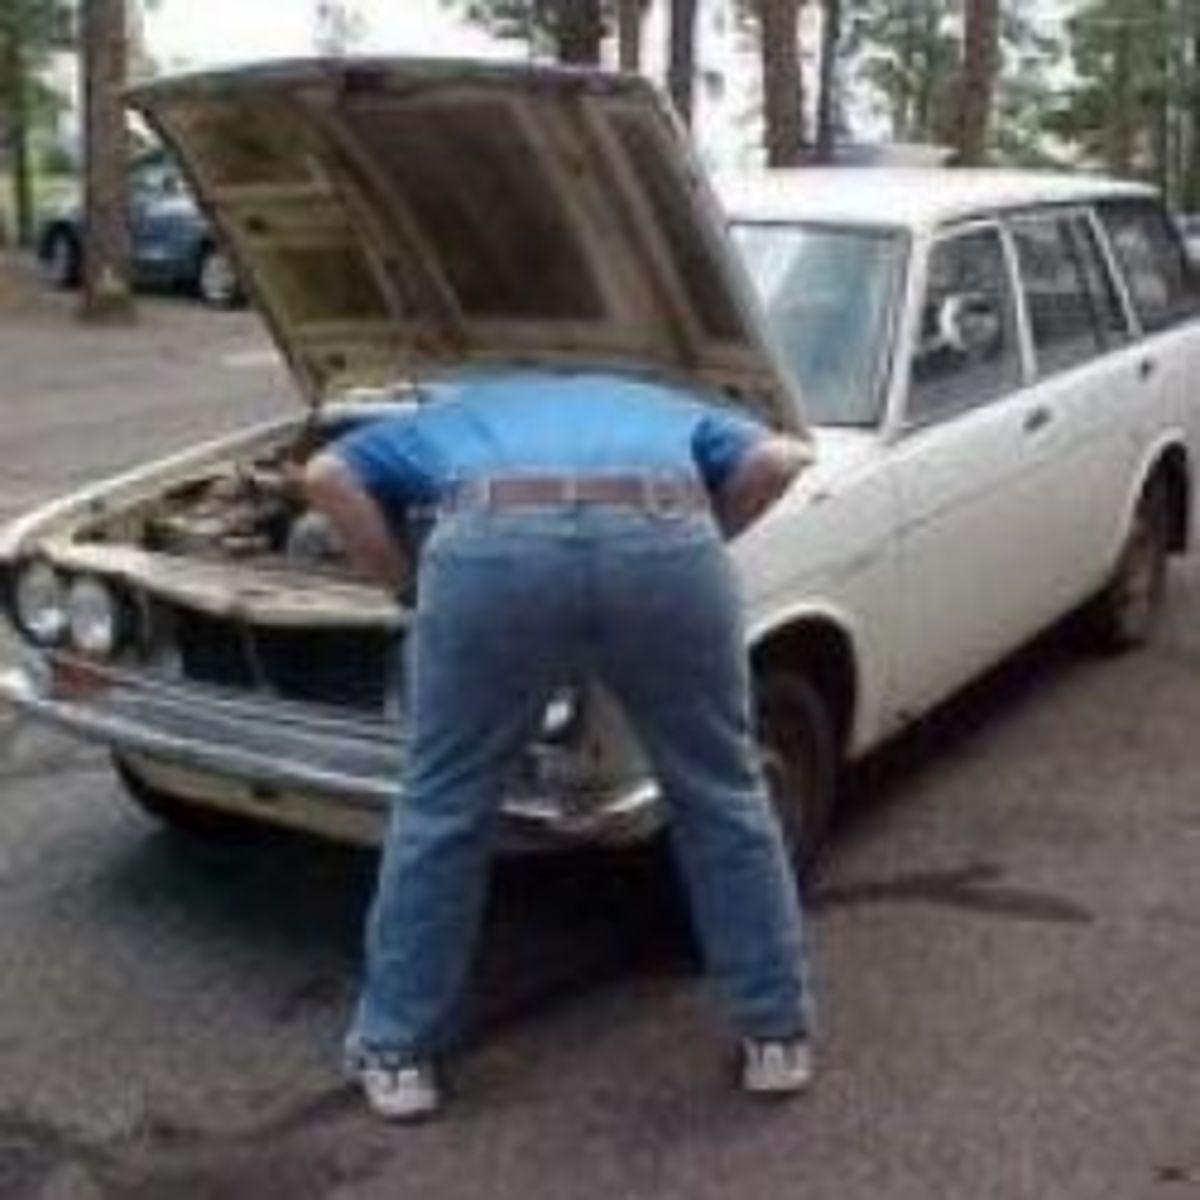 My Husband Brought Home a 100-Dollar Datsun